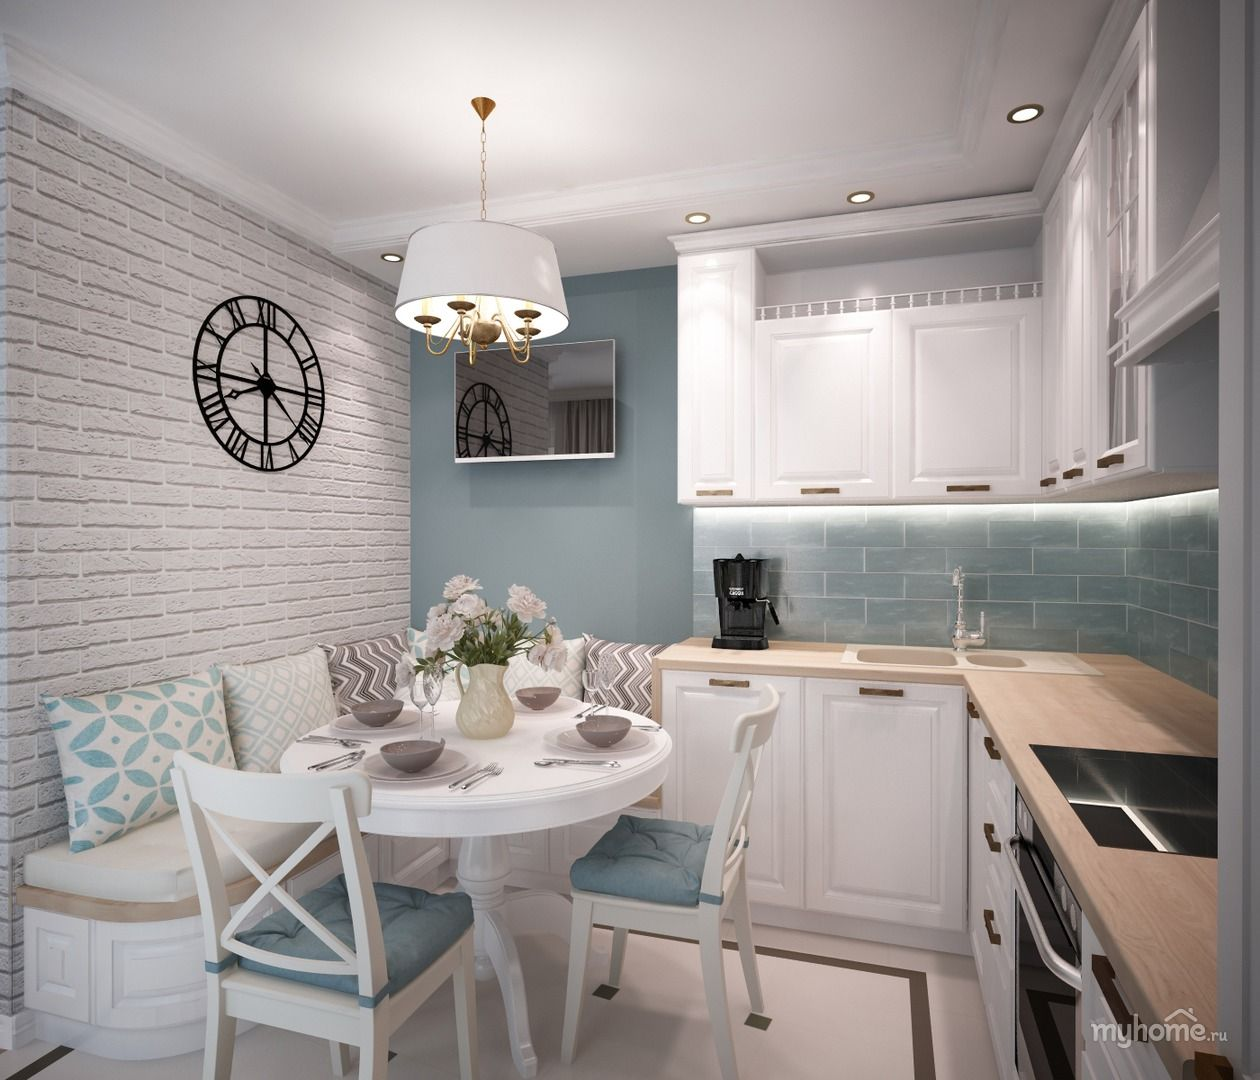 Небольшая уютная угловая кухня